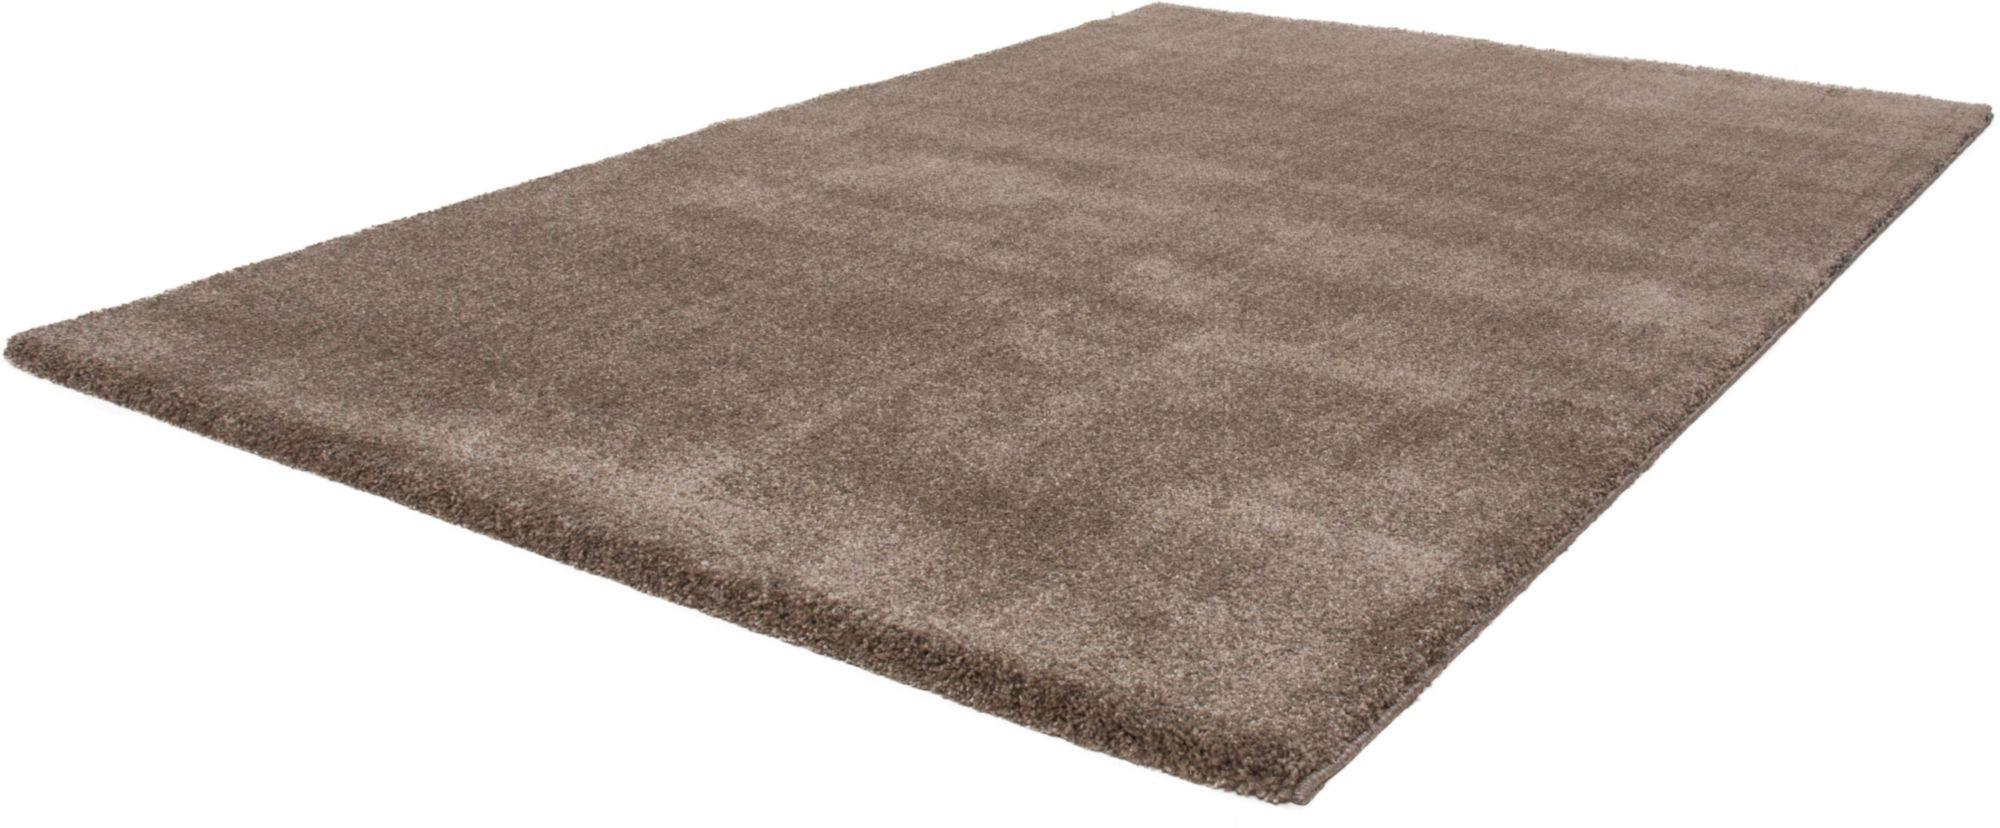 Teppich, »Valencia900«, Lalee, rechteckig, Höhe 23 mm, maschinell gewebt